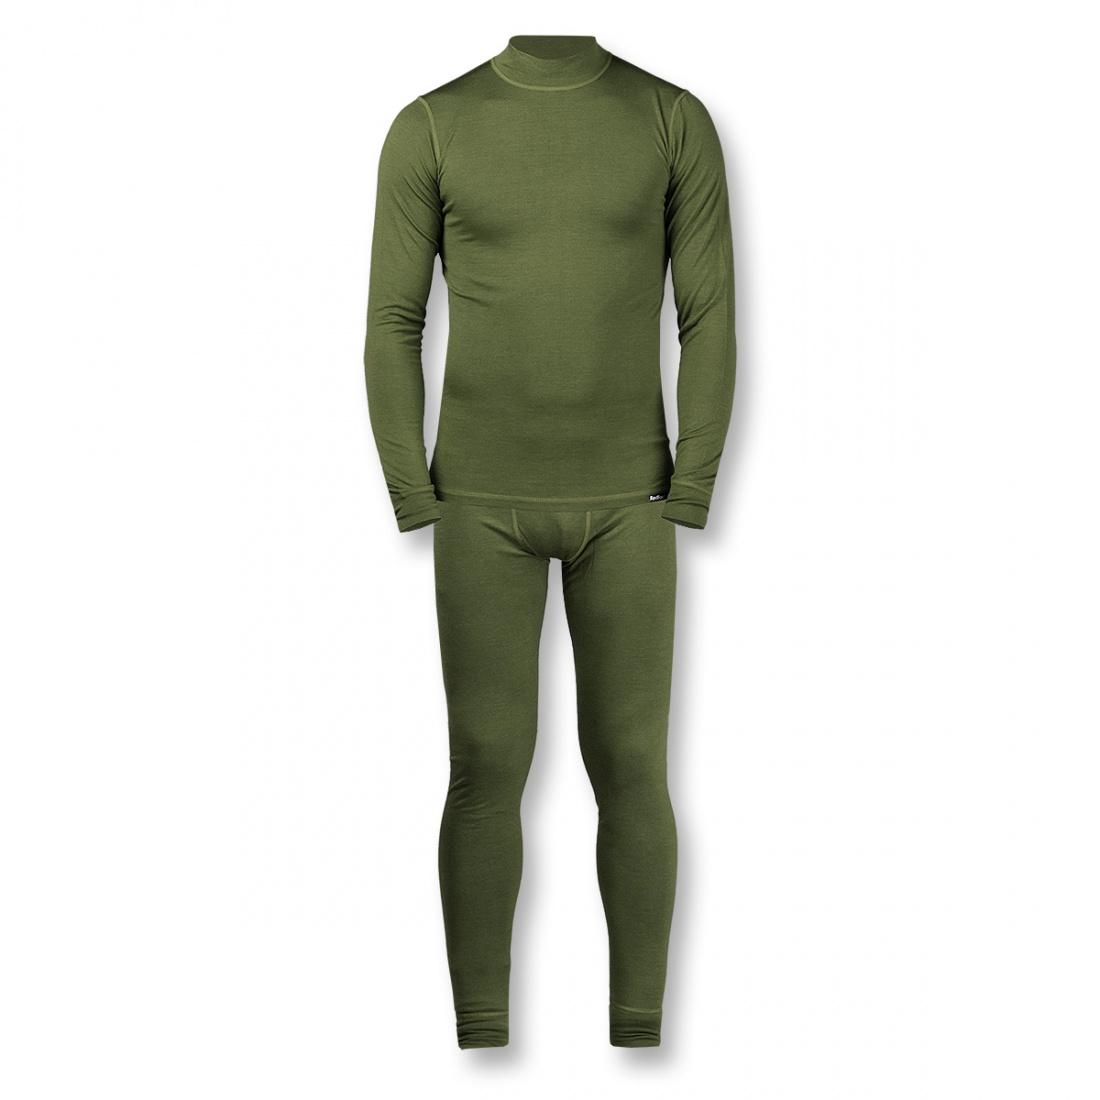 Термобелье костюм Wool Dry Light МужскойКомплекты<br><br><br>Цвет: Зеленый<br>Размер: 56